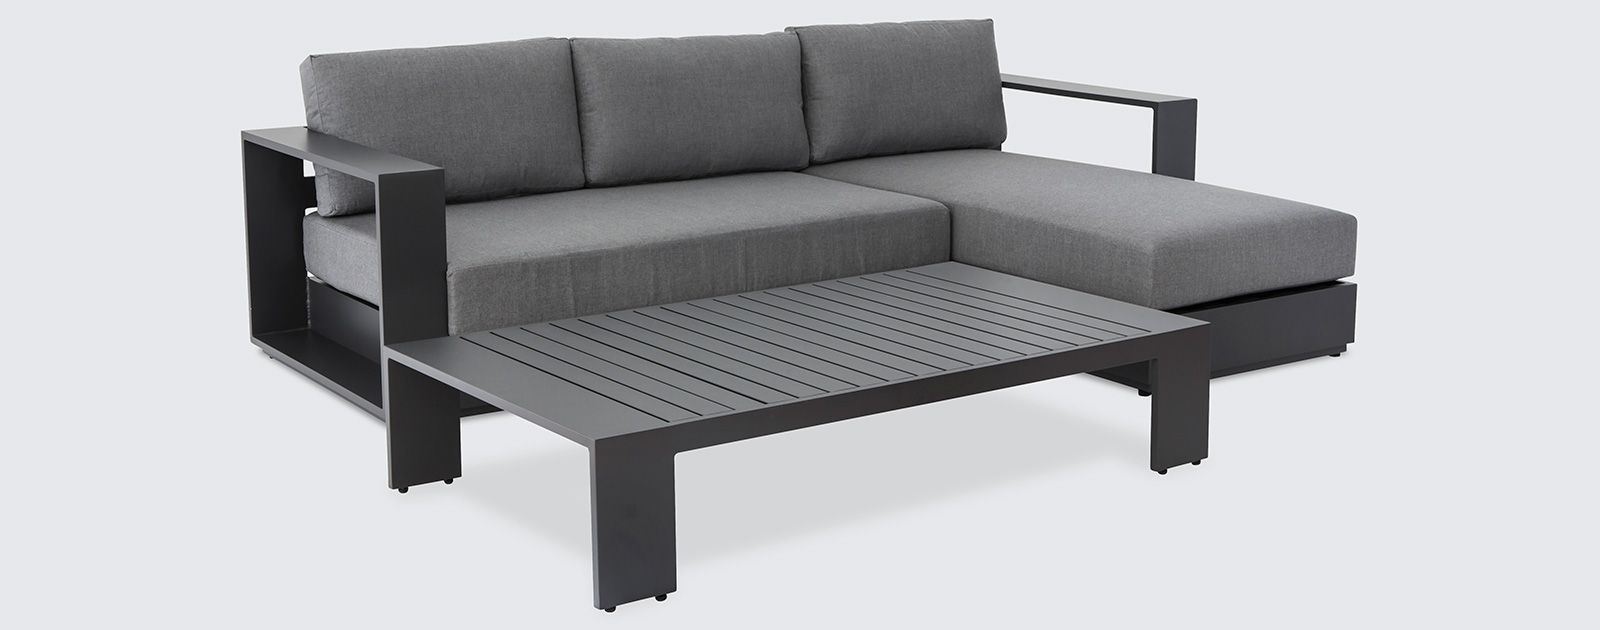 Outdoor Sofa Nz Outdoor Sofa Furniture Design Concepts Outdoor Furniture Sofa Couch Design Outdoor Couch